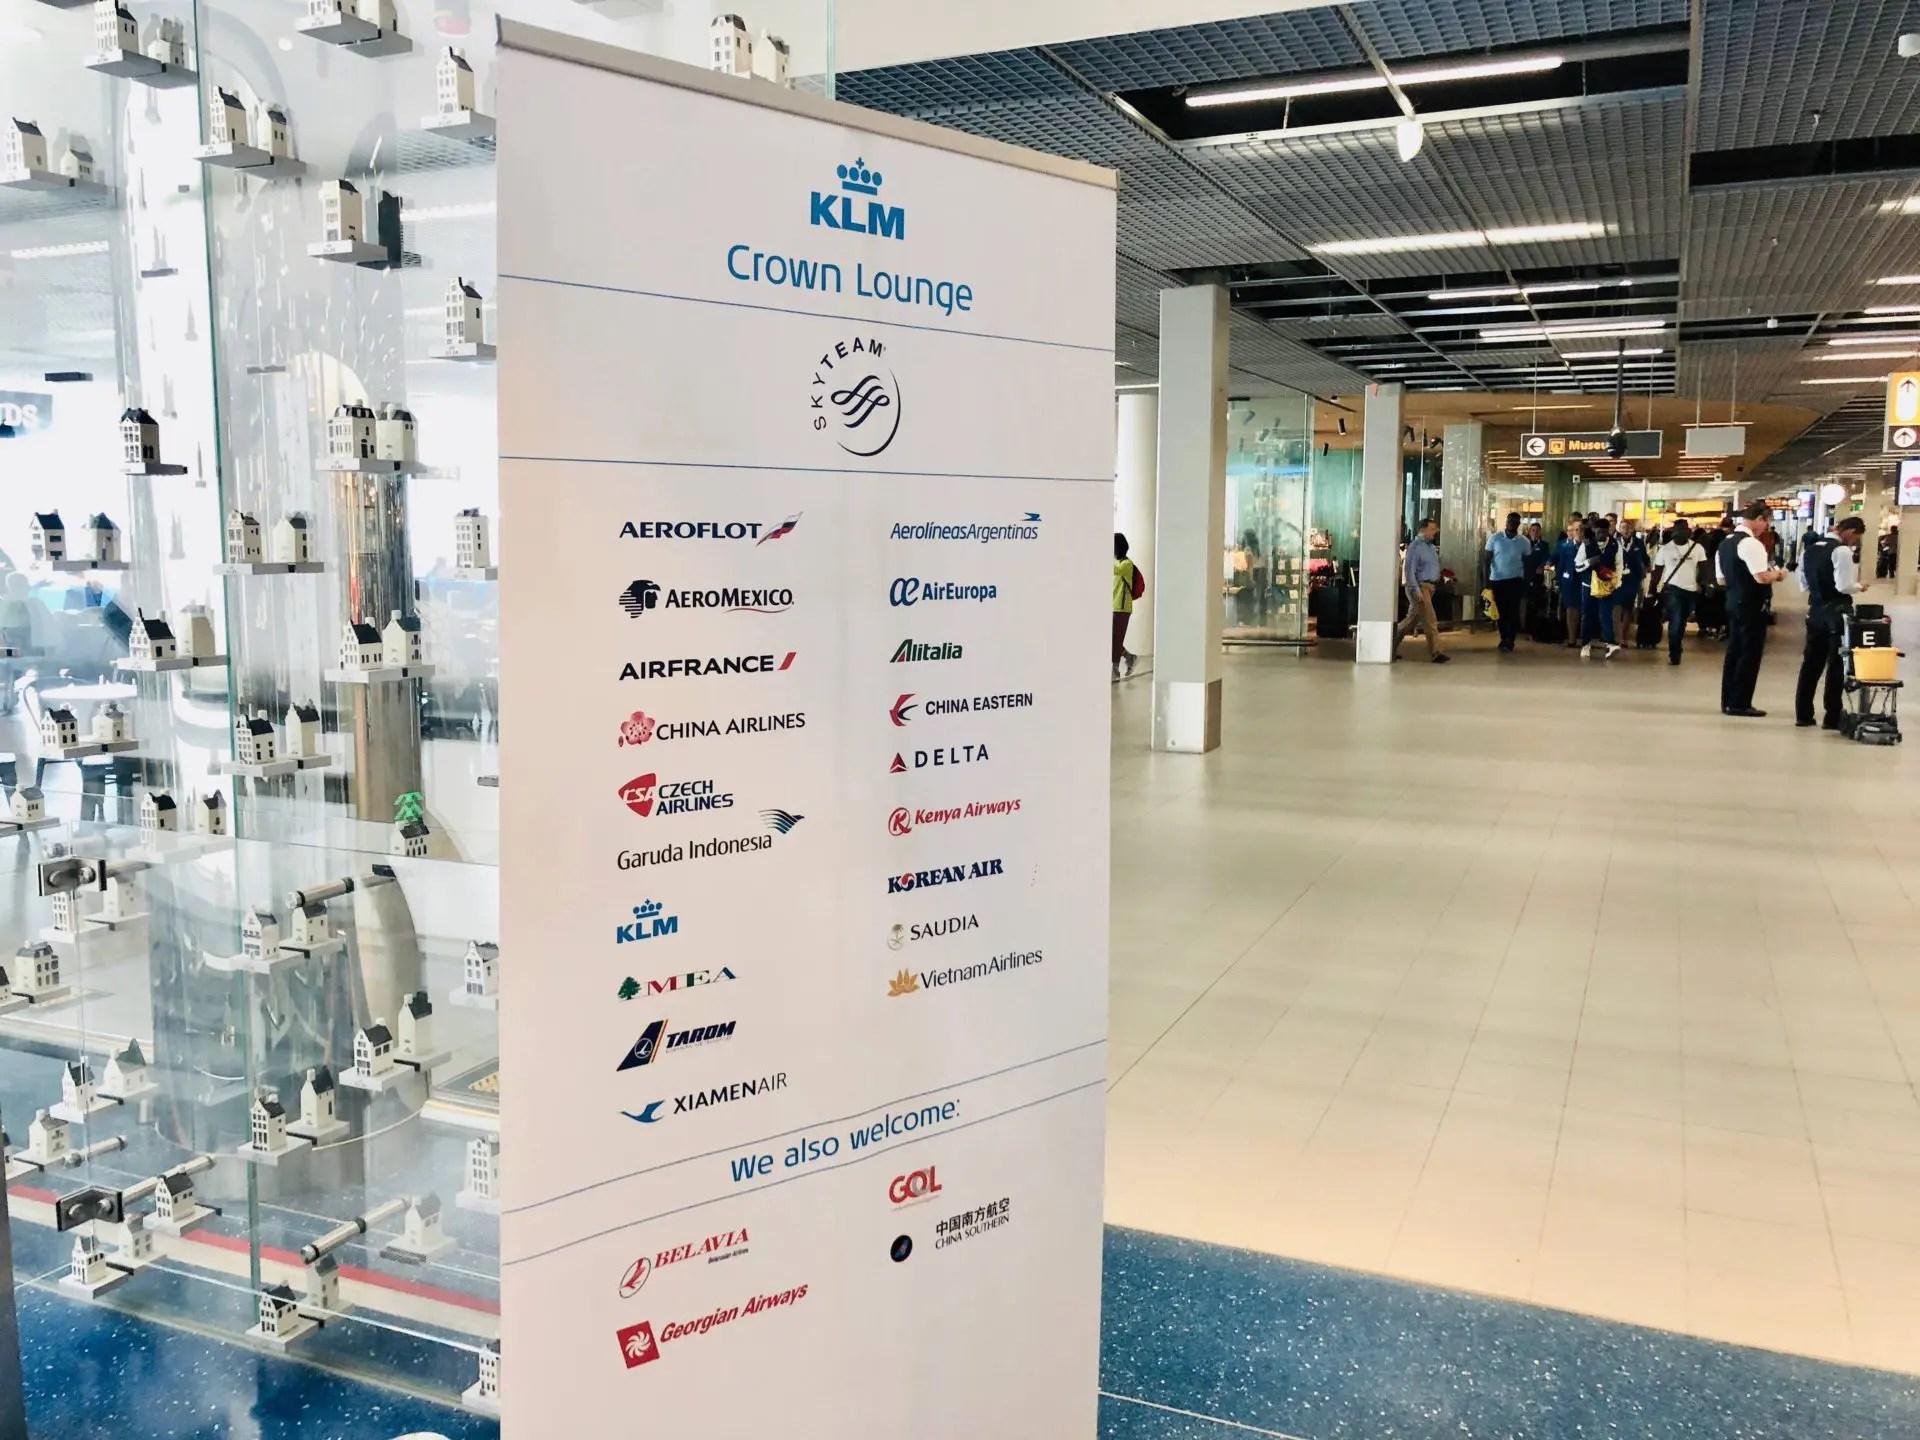 KLM Crown Lounge acesso